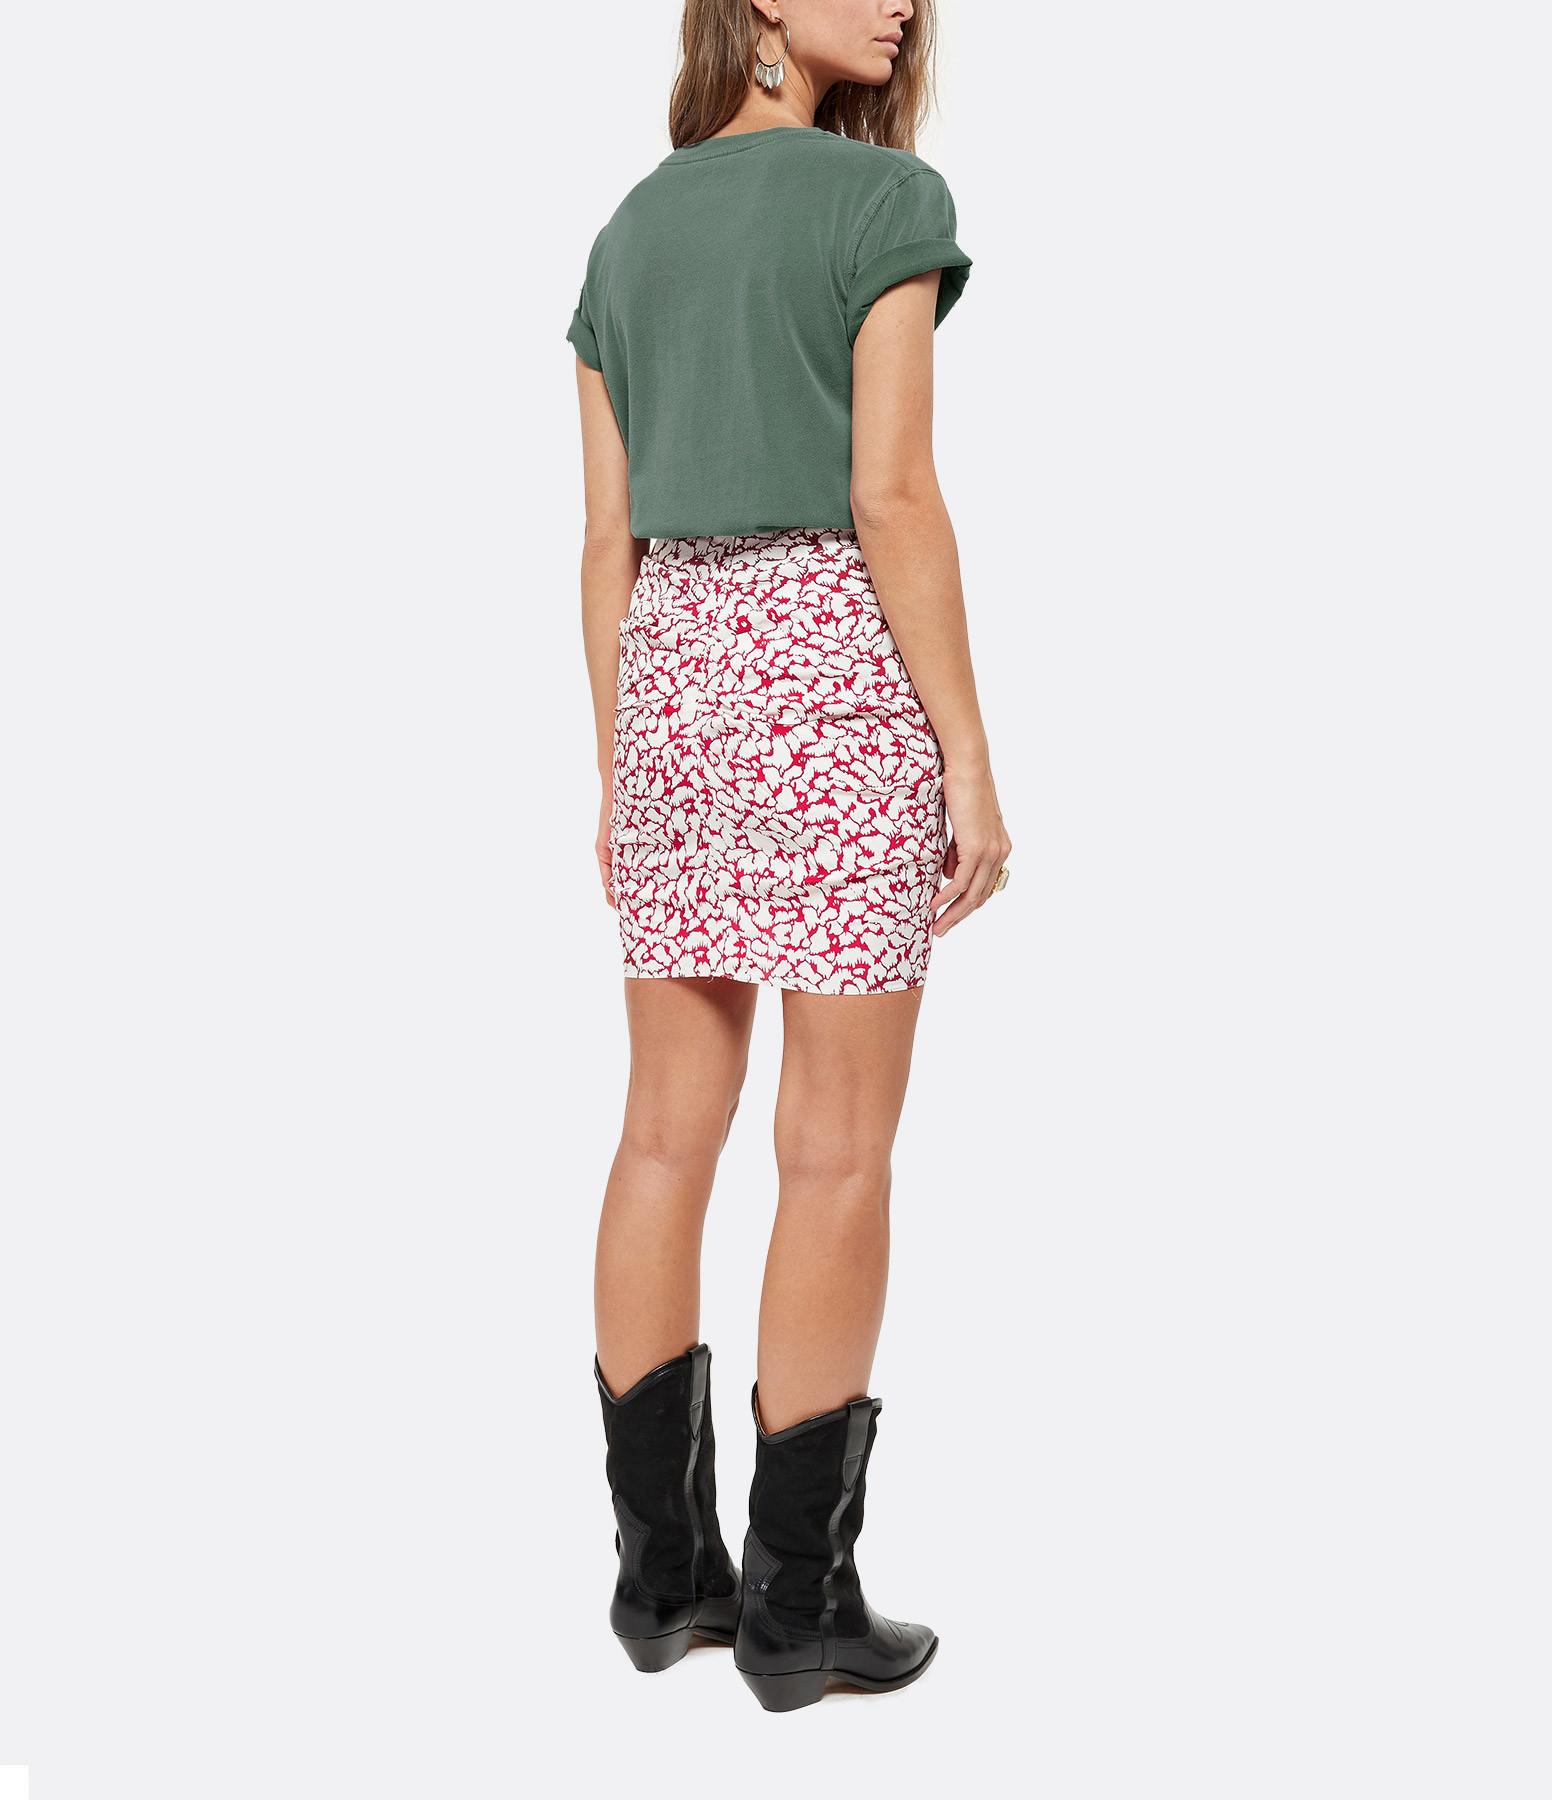 NEWTONE - Tee-shirt Phoenix Fit Trucker Coton Forest